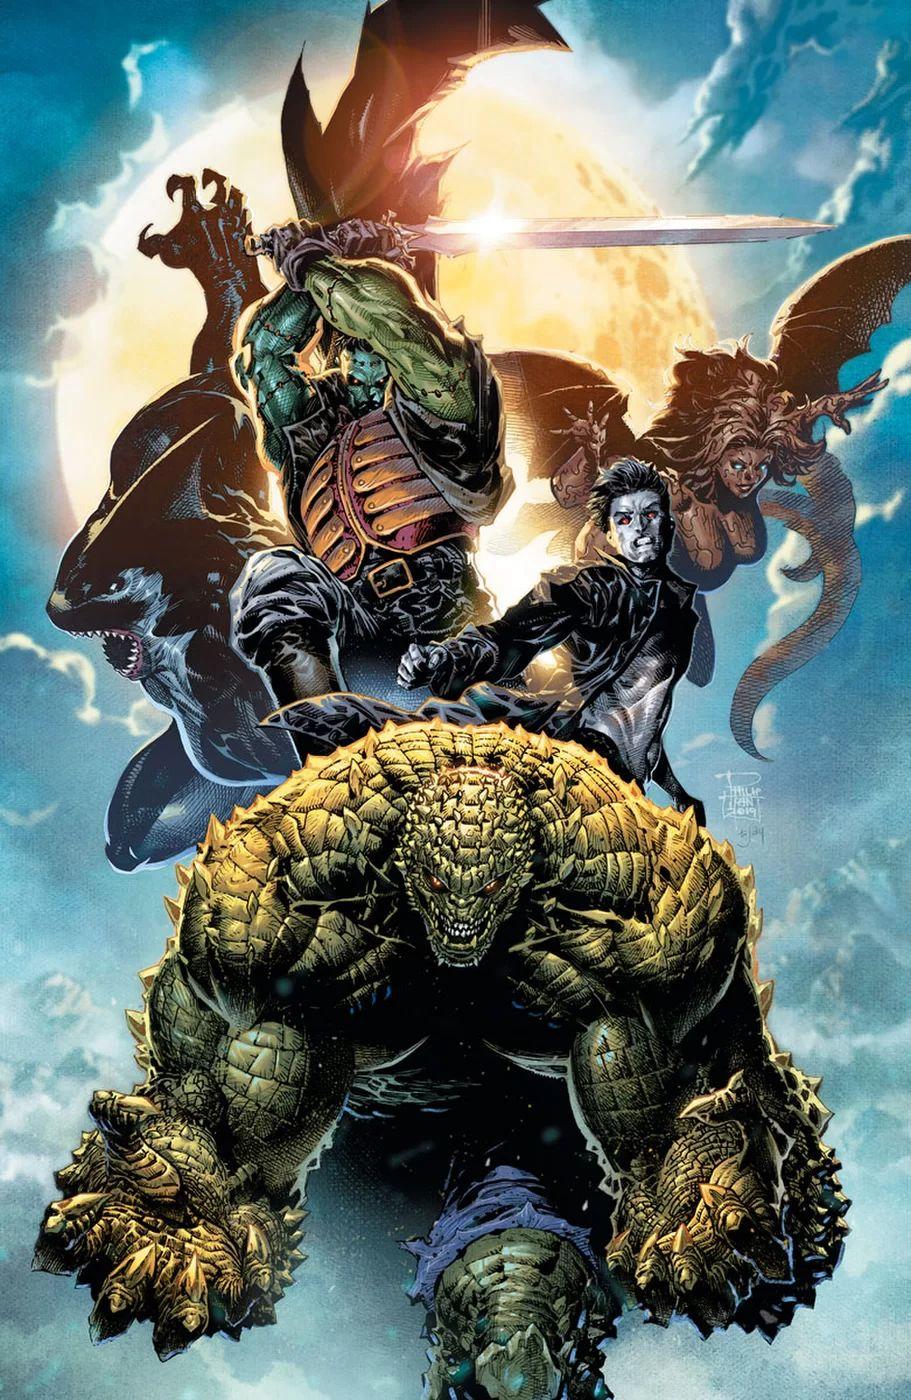 Gotham City Monsters